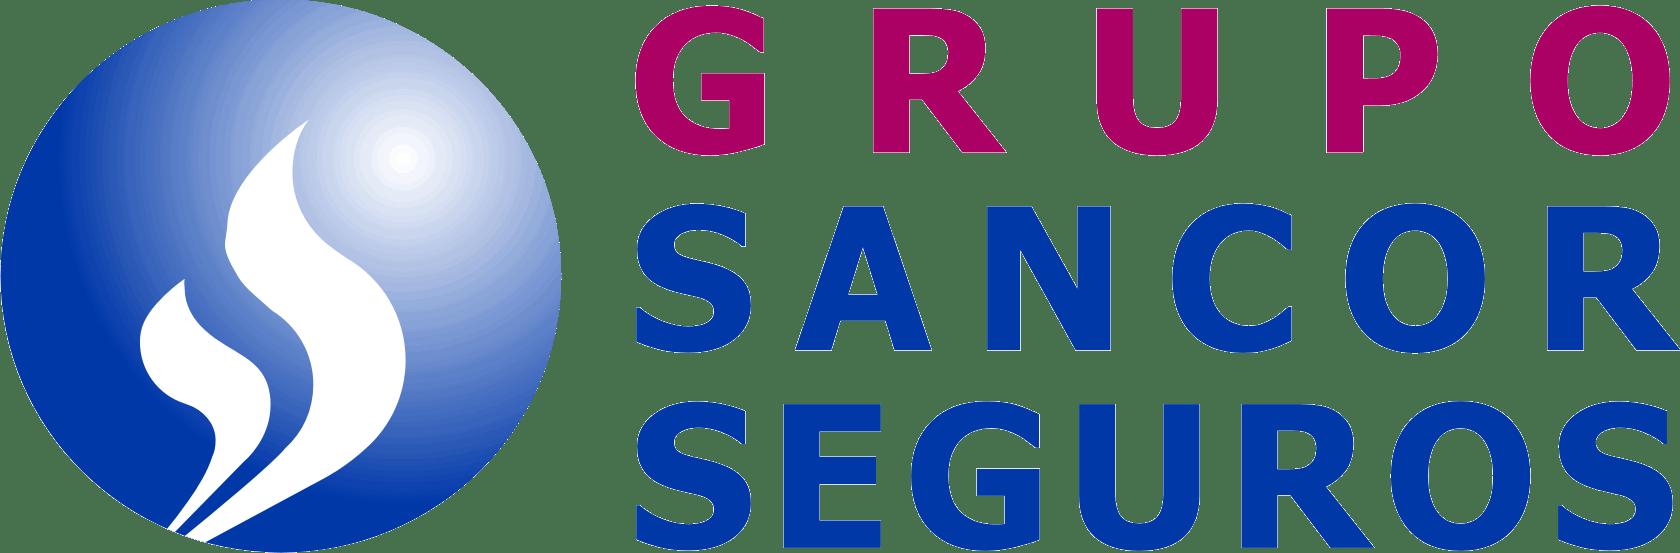 14-Sancor